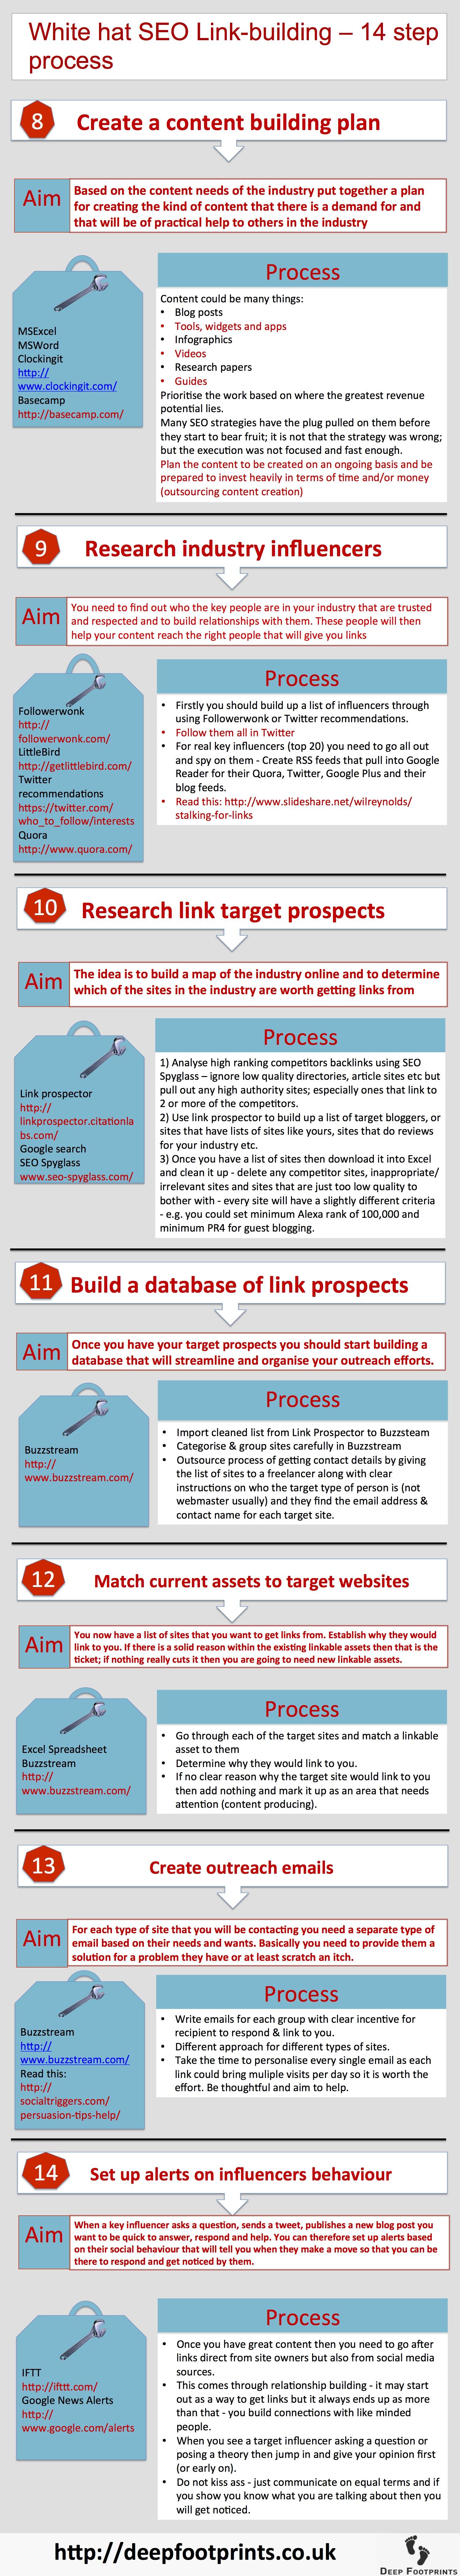 SEO linkbuilding 14 step guide part 2